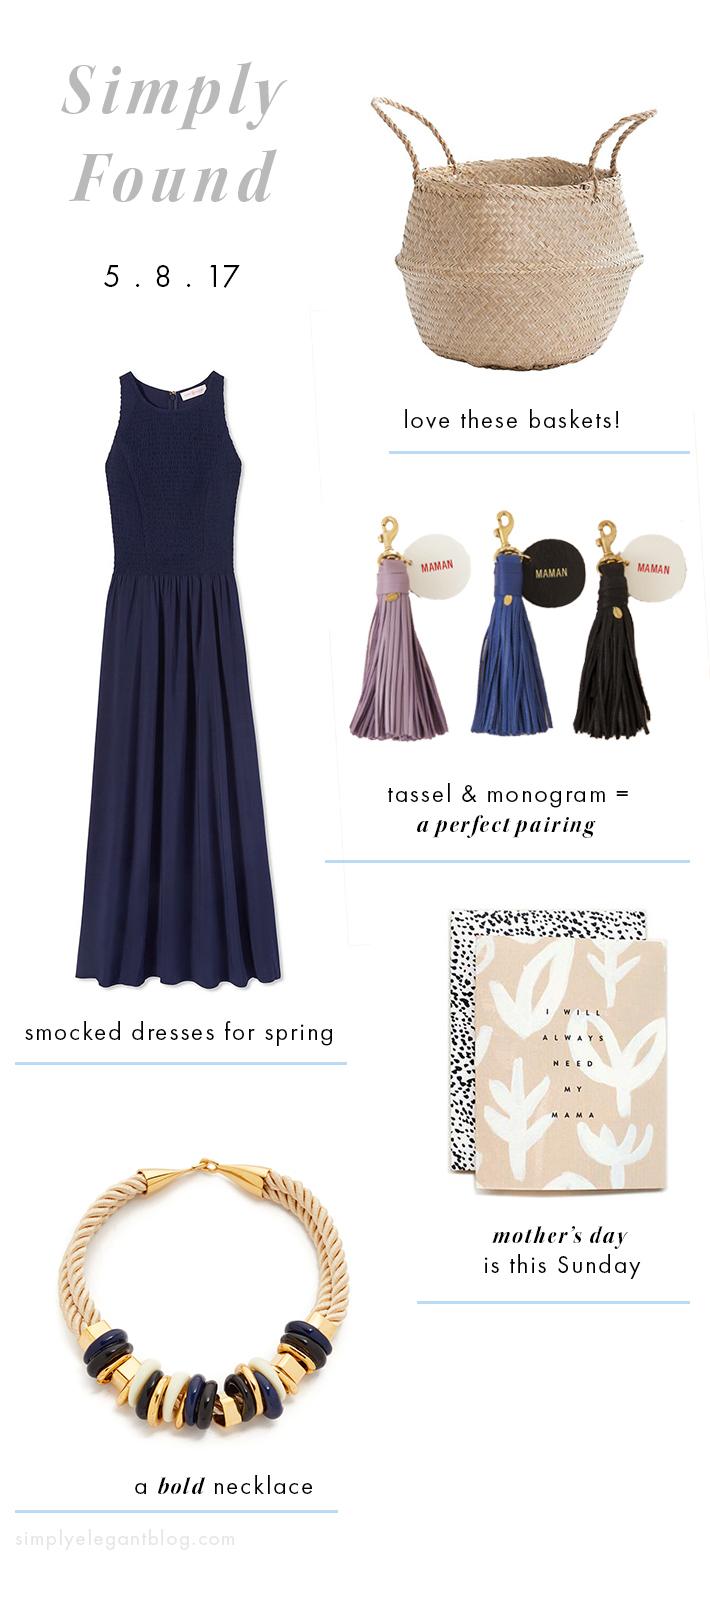 Tory Burch Smocked Dress, Lizzie Fortunate Necklace